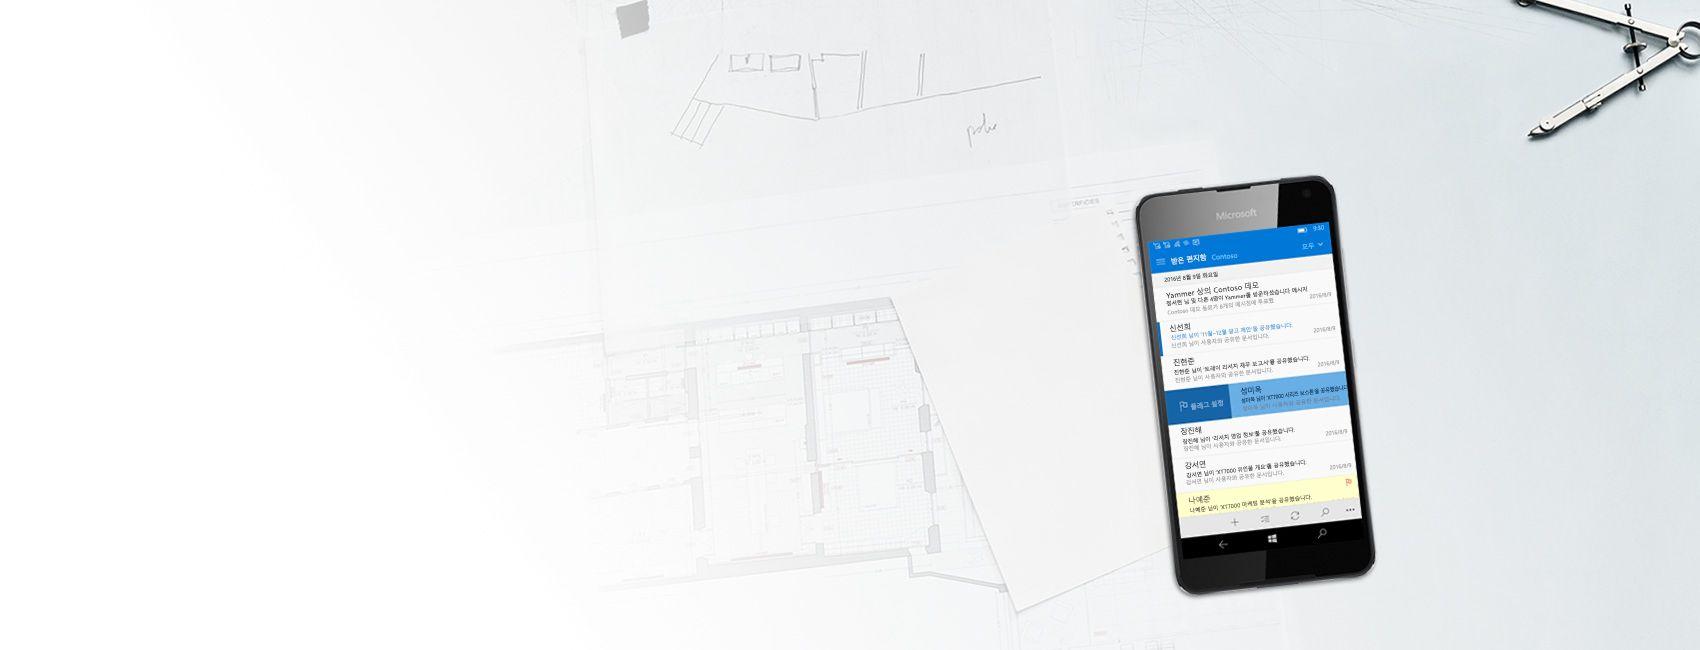 Windows 10 Mobile용 Outlook에서 전자 메일 받은 편지함이 표시된 Windows 휴대폰